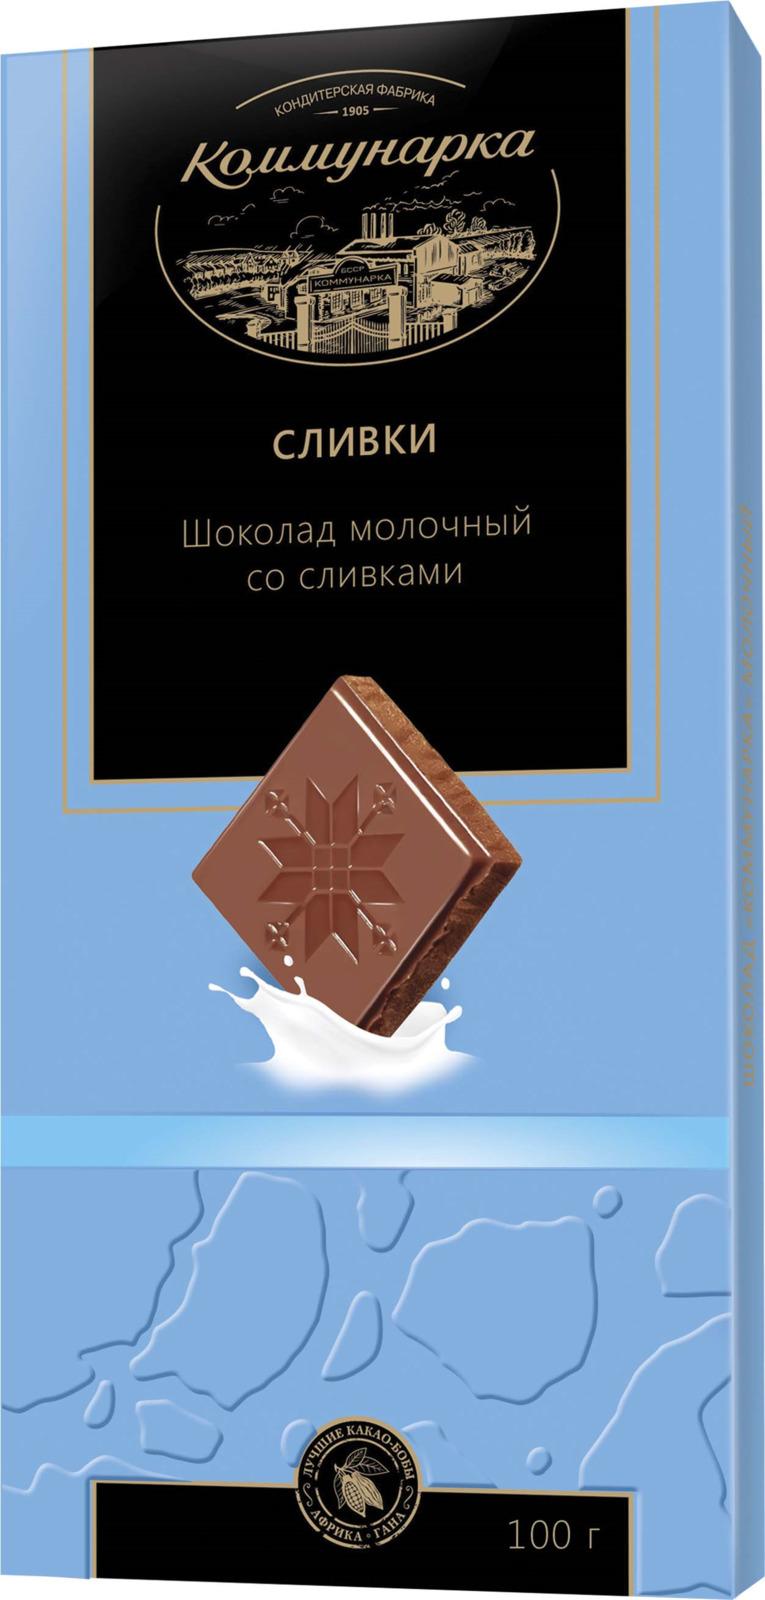 Коммунарка шоколад молочный, со сливками, 100 г коммунарка шоколад молочный с кокосовой нугой 85 г